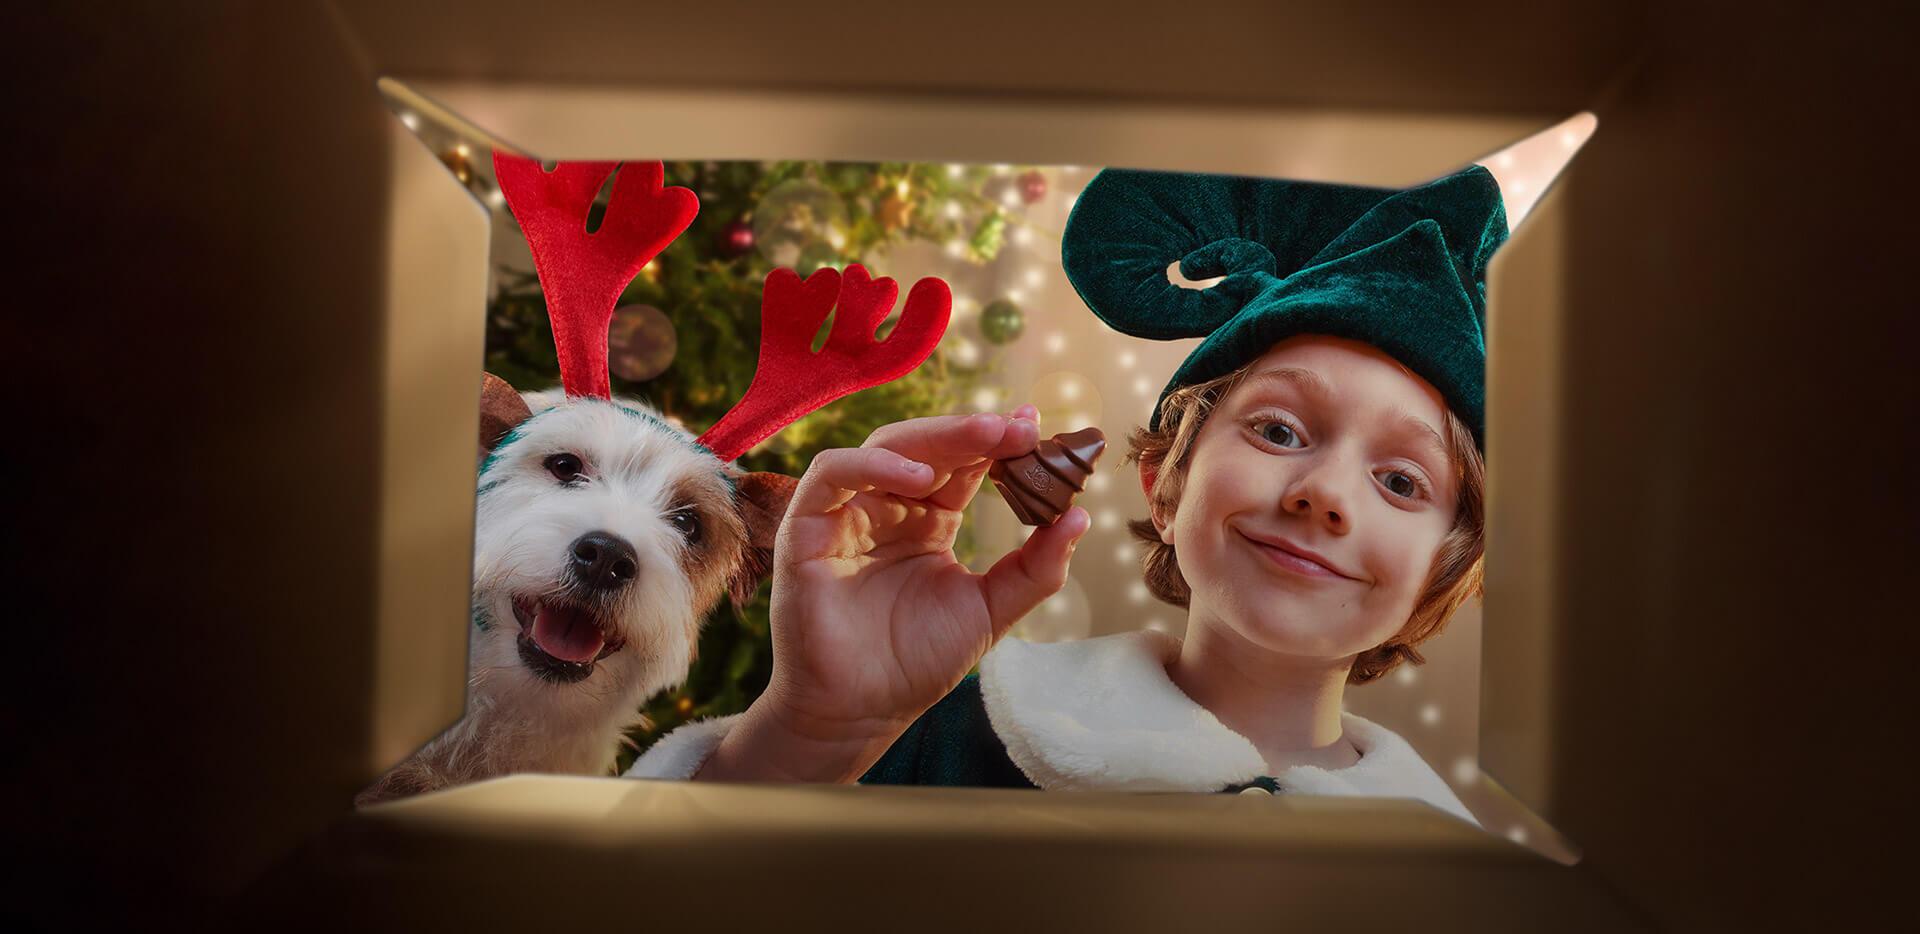 https://www.leonidas.com/sites/default/files/2018-11/leonidas-christmas-banner.jpg